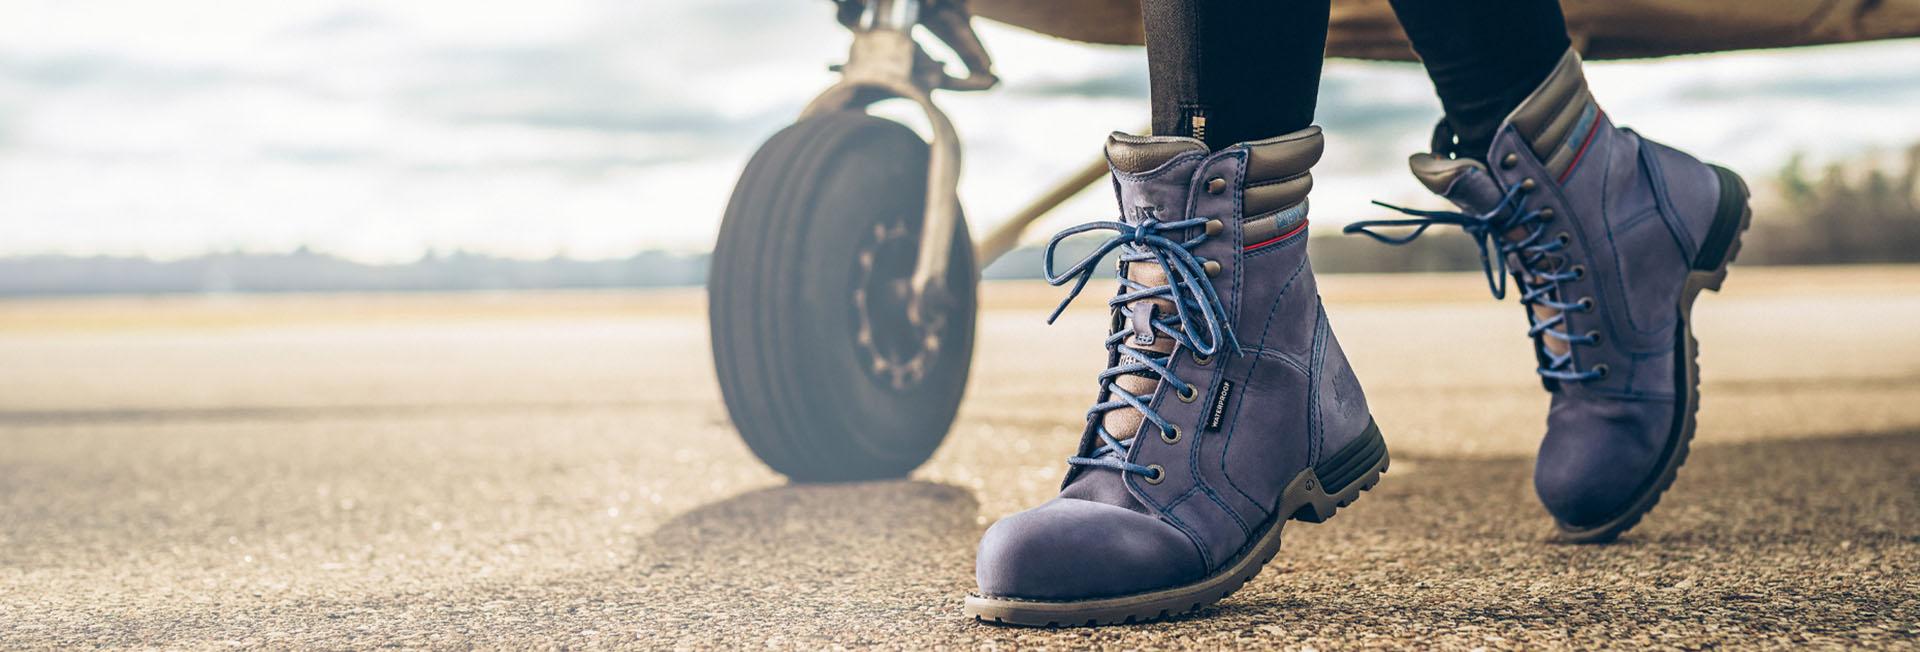 Boots walking on a runway beside a plane.